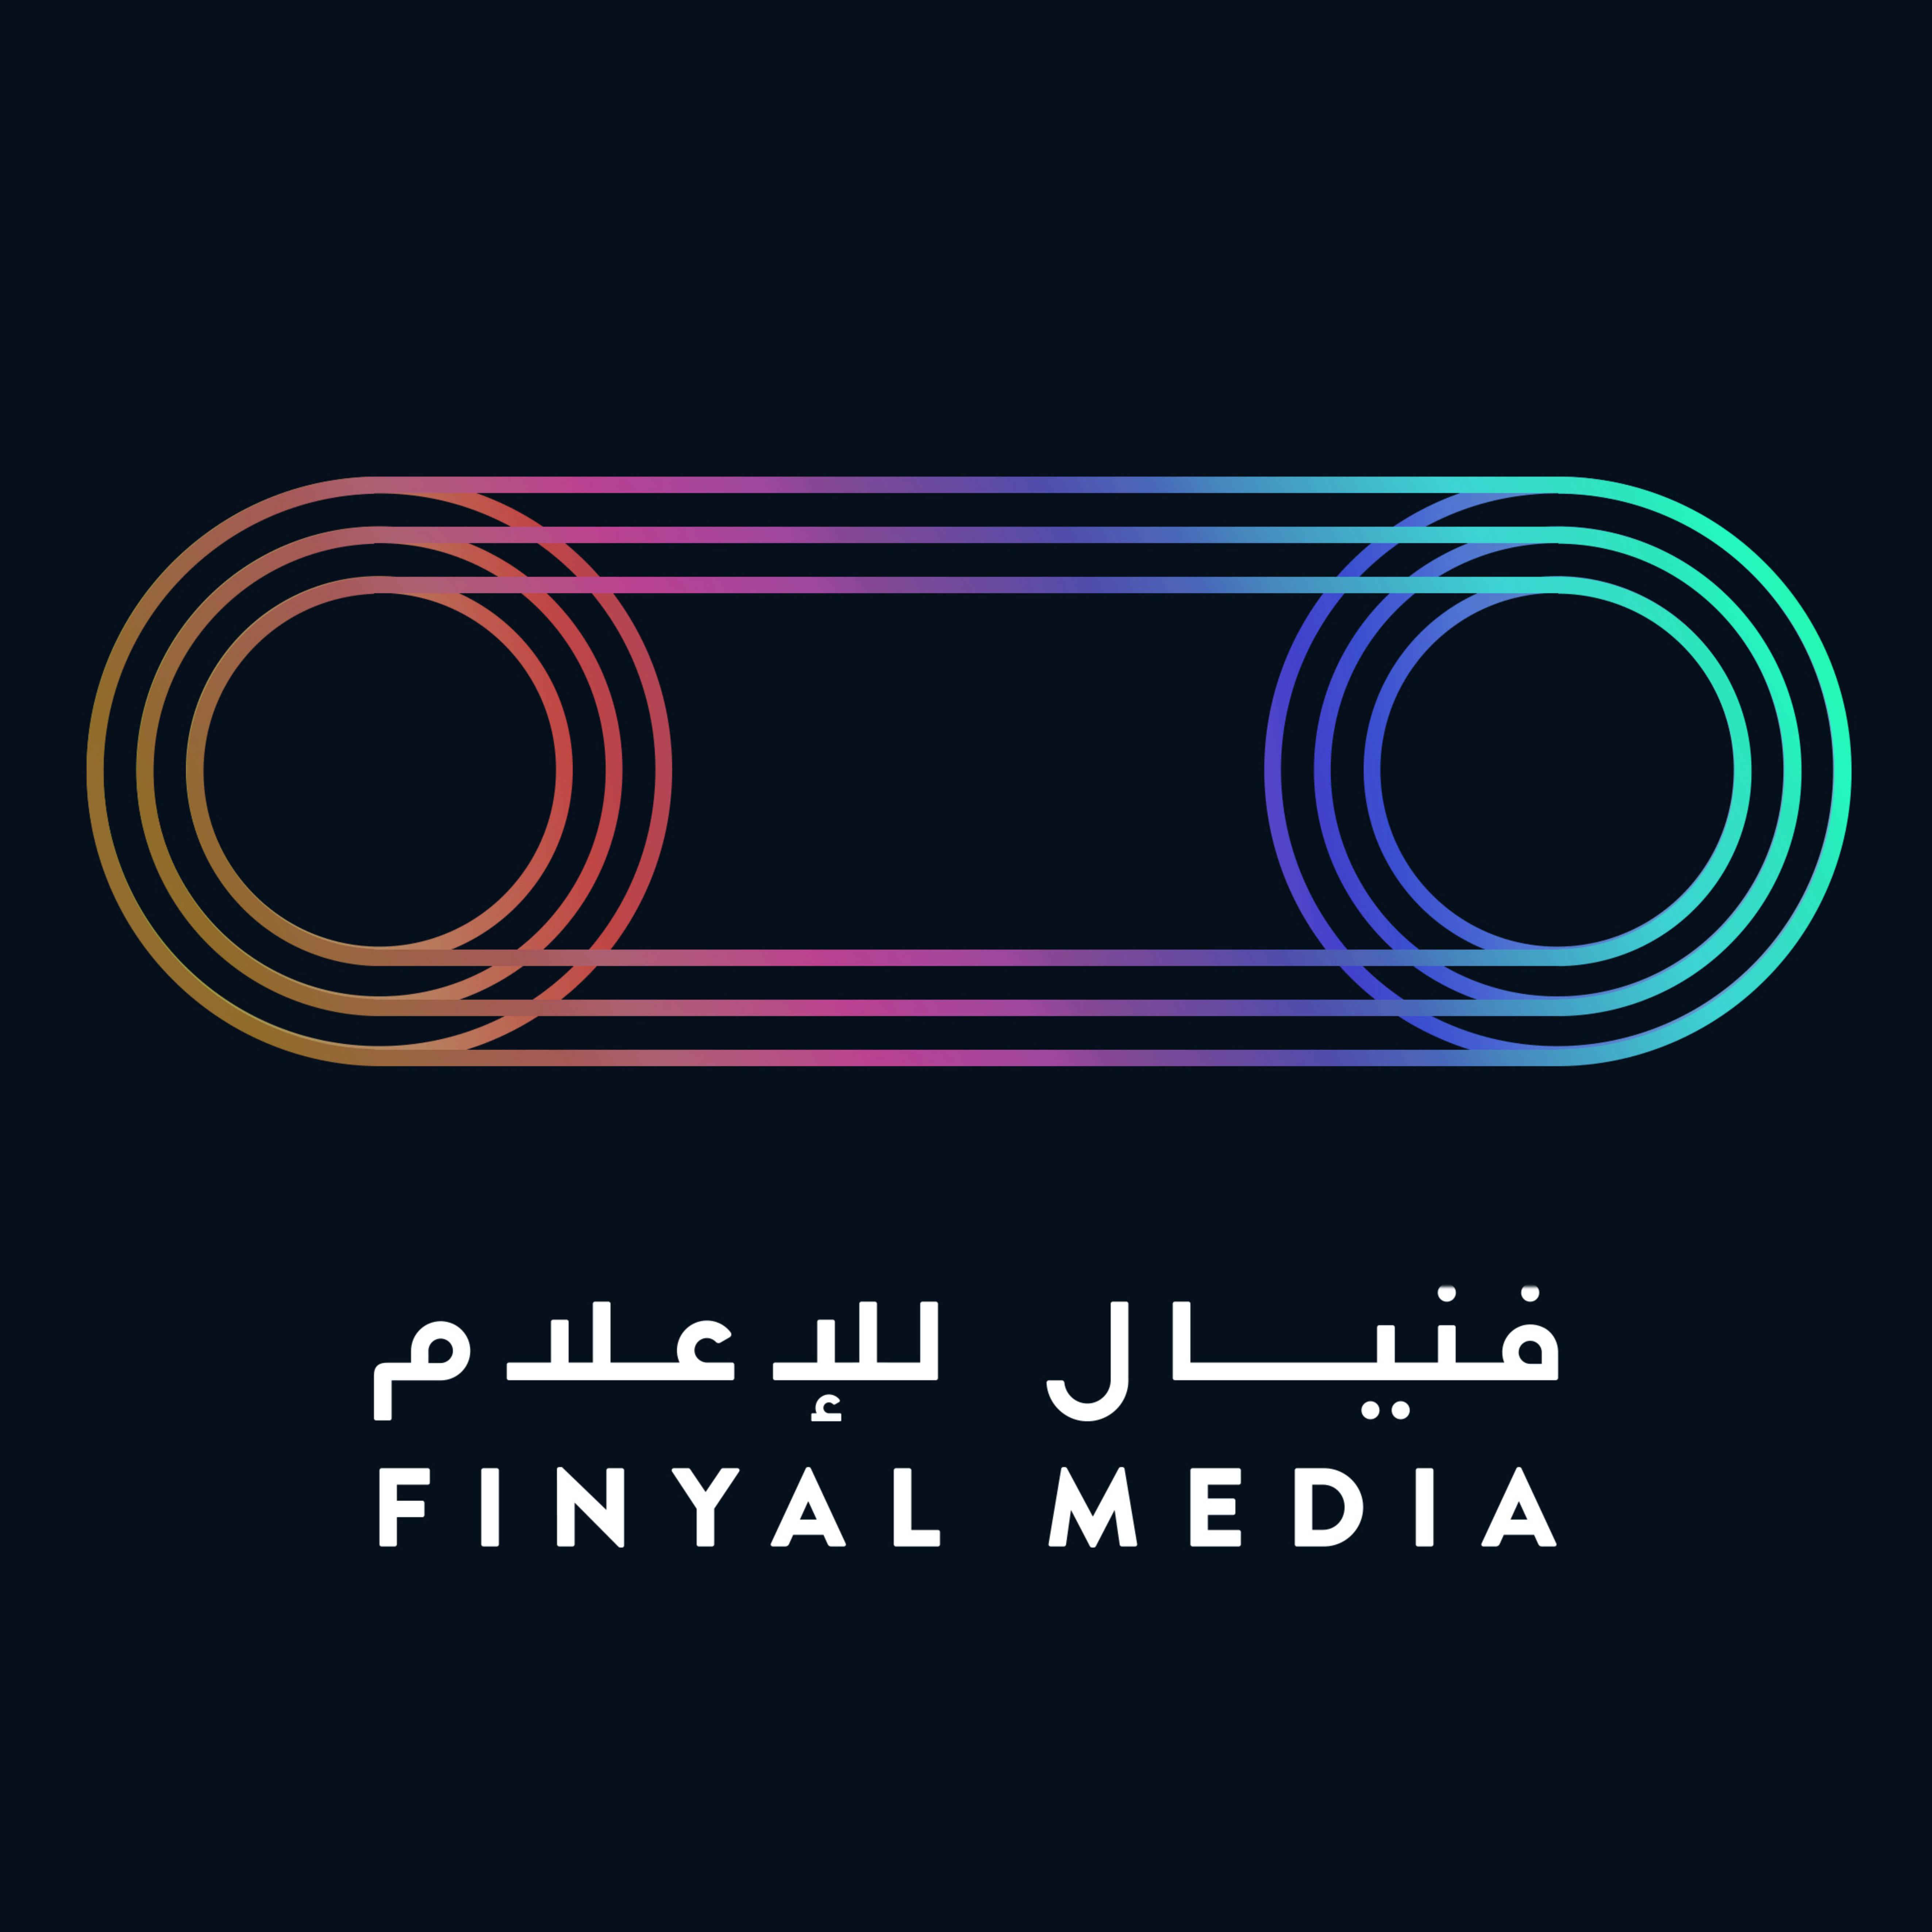 Finyal Media